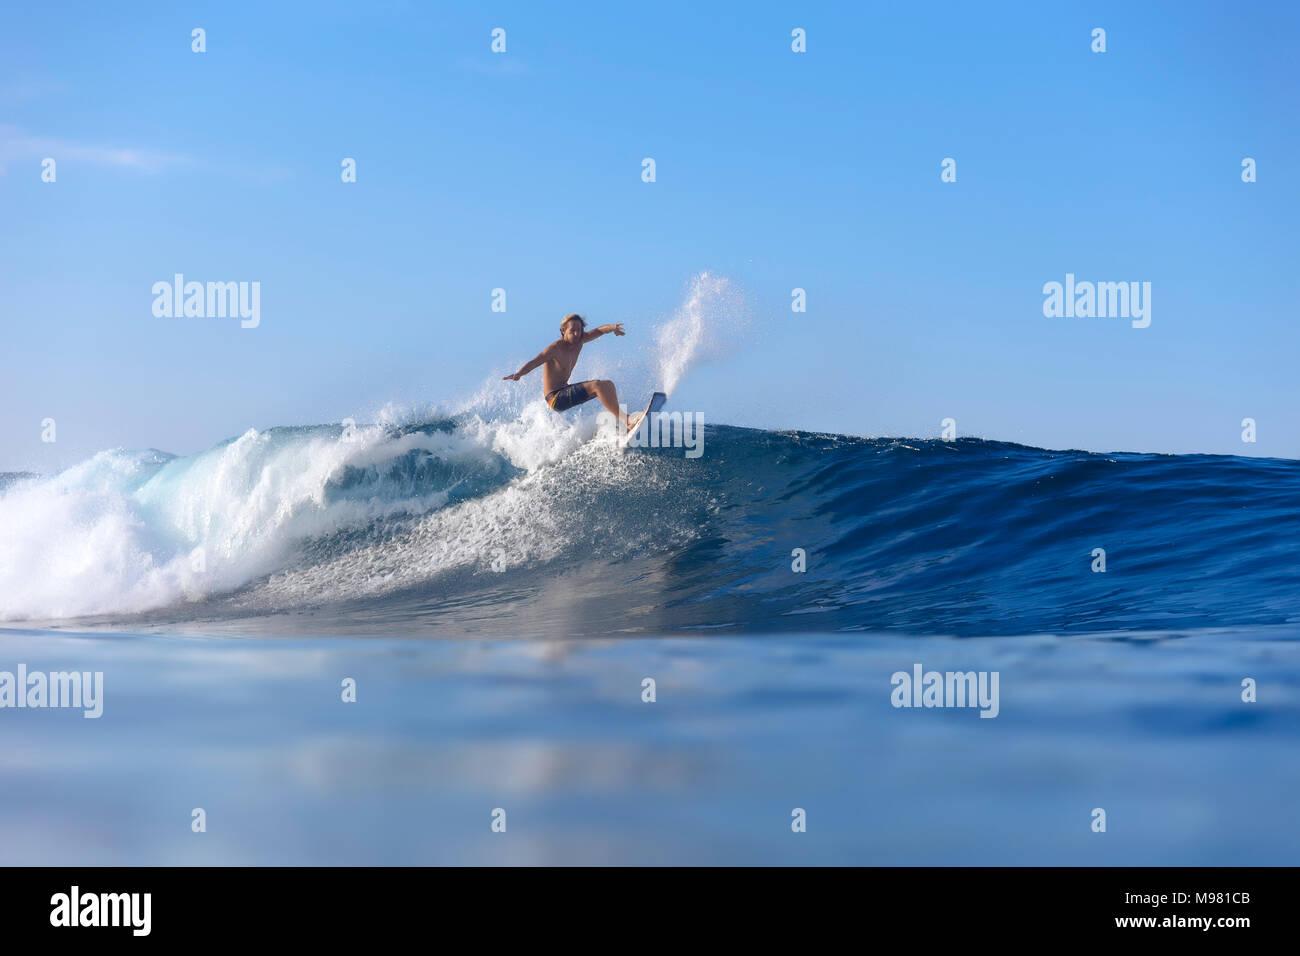 Indonesia, Sumatra, surfer on a wave - Stock Image